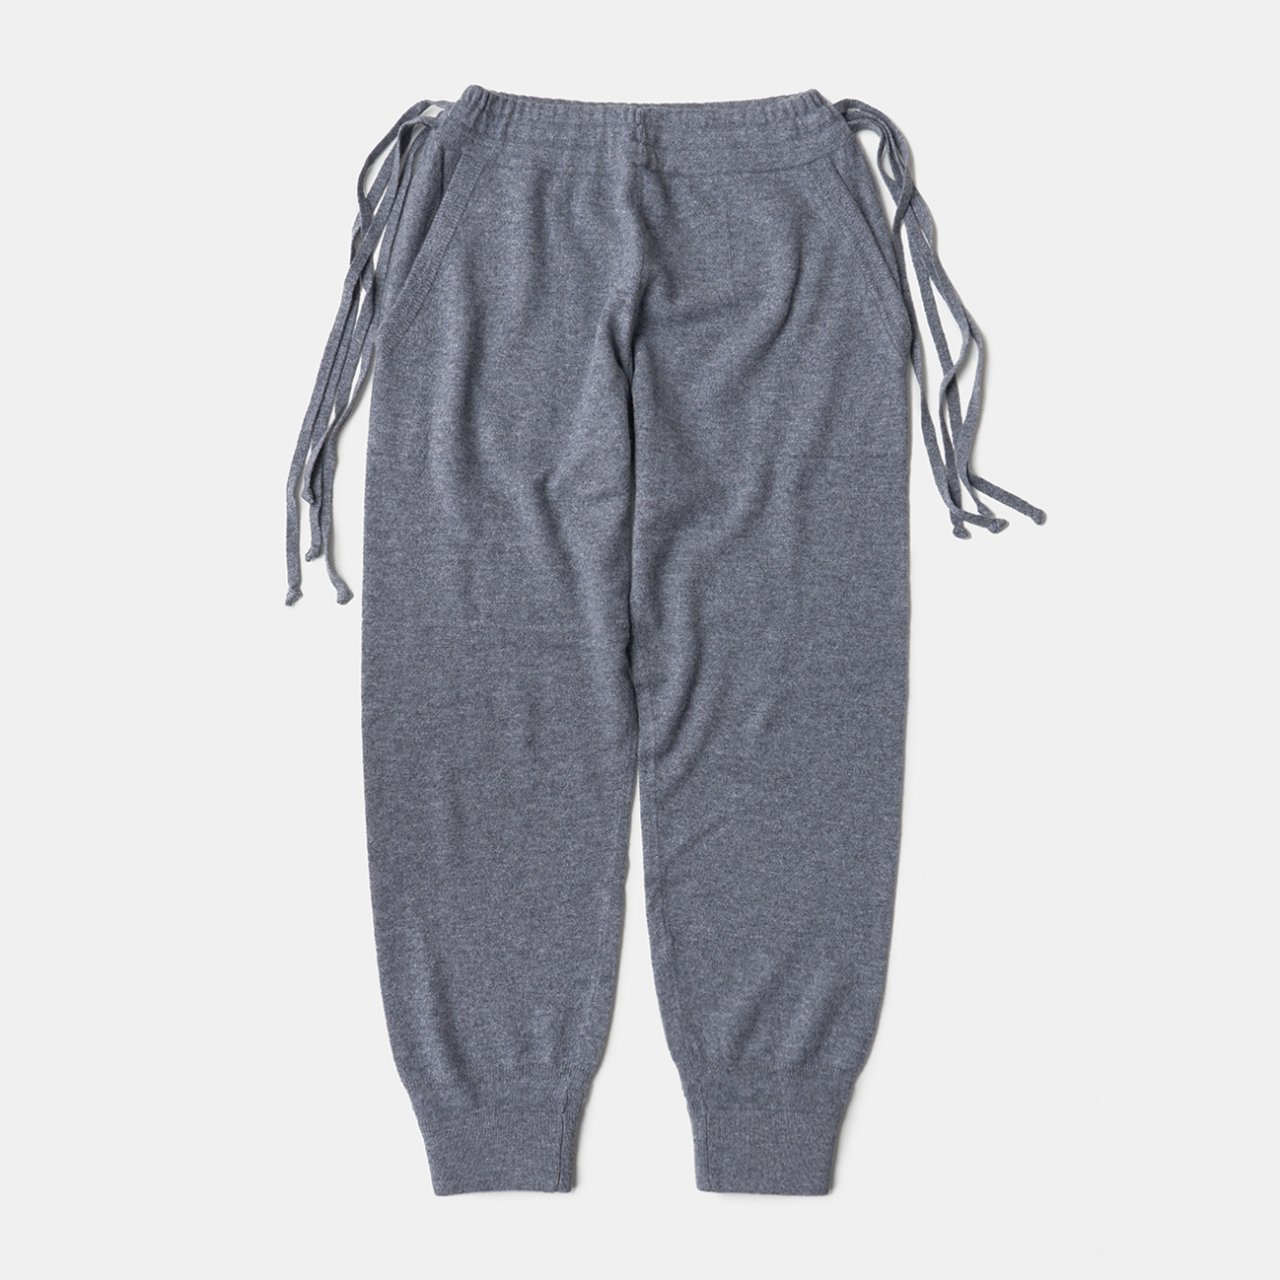 CASHMERE  BASIC BoyFriend PANTS<BR>GREY